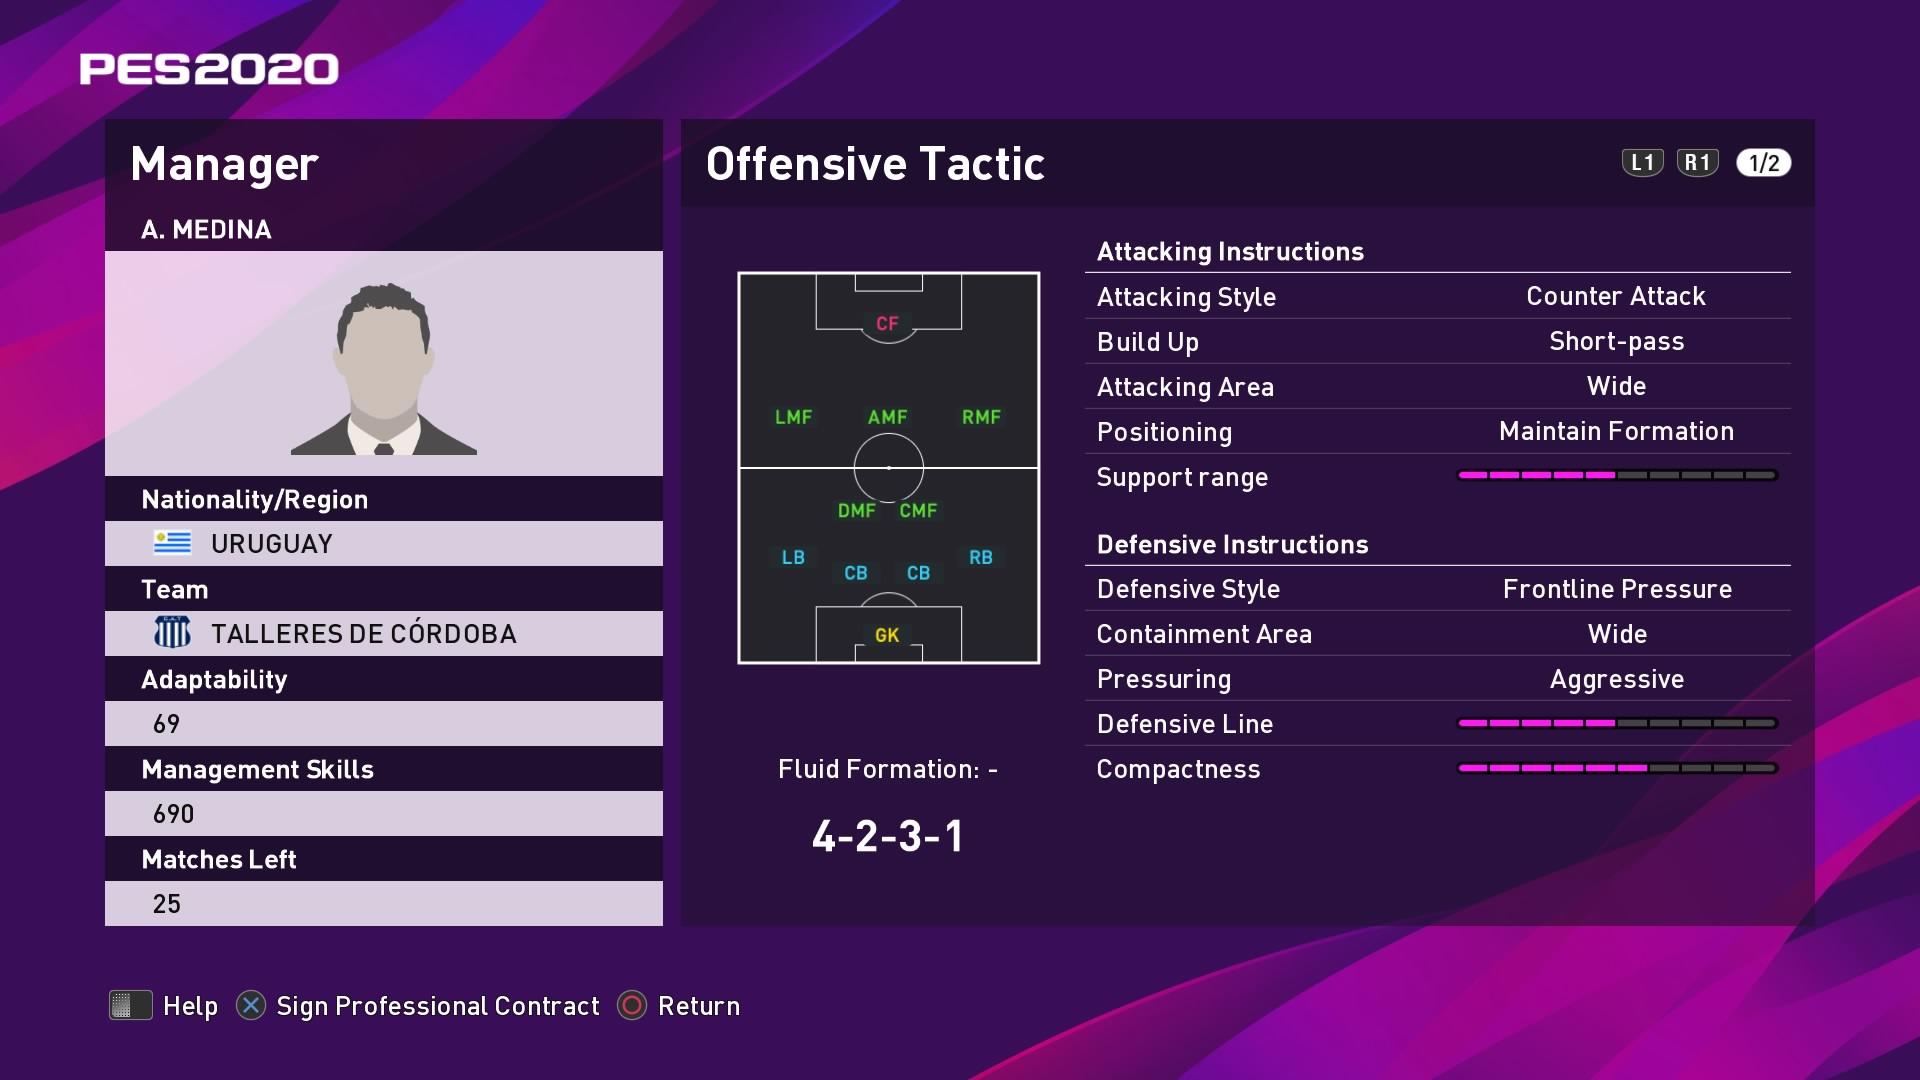 A. Medina (Alexander Medina) Offensive Tactic in PES 2020 myClub